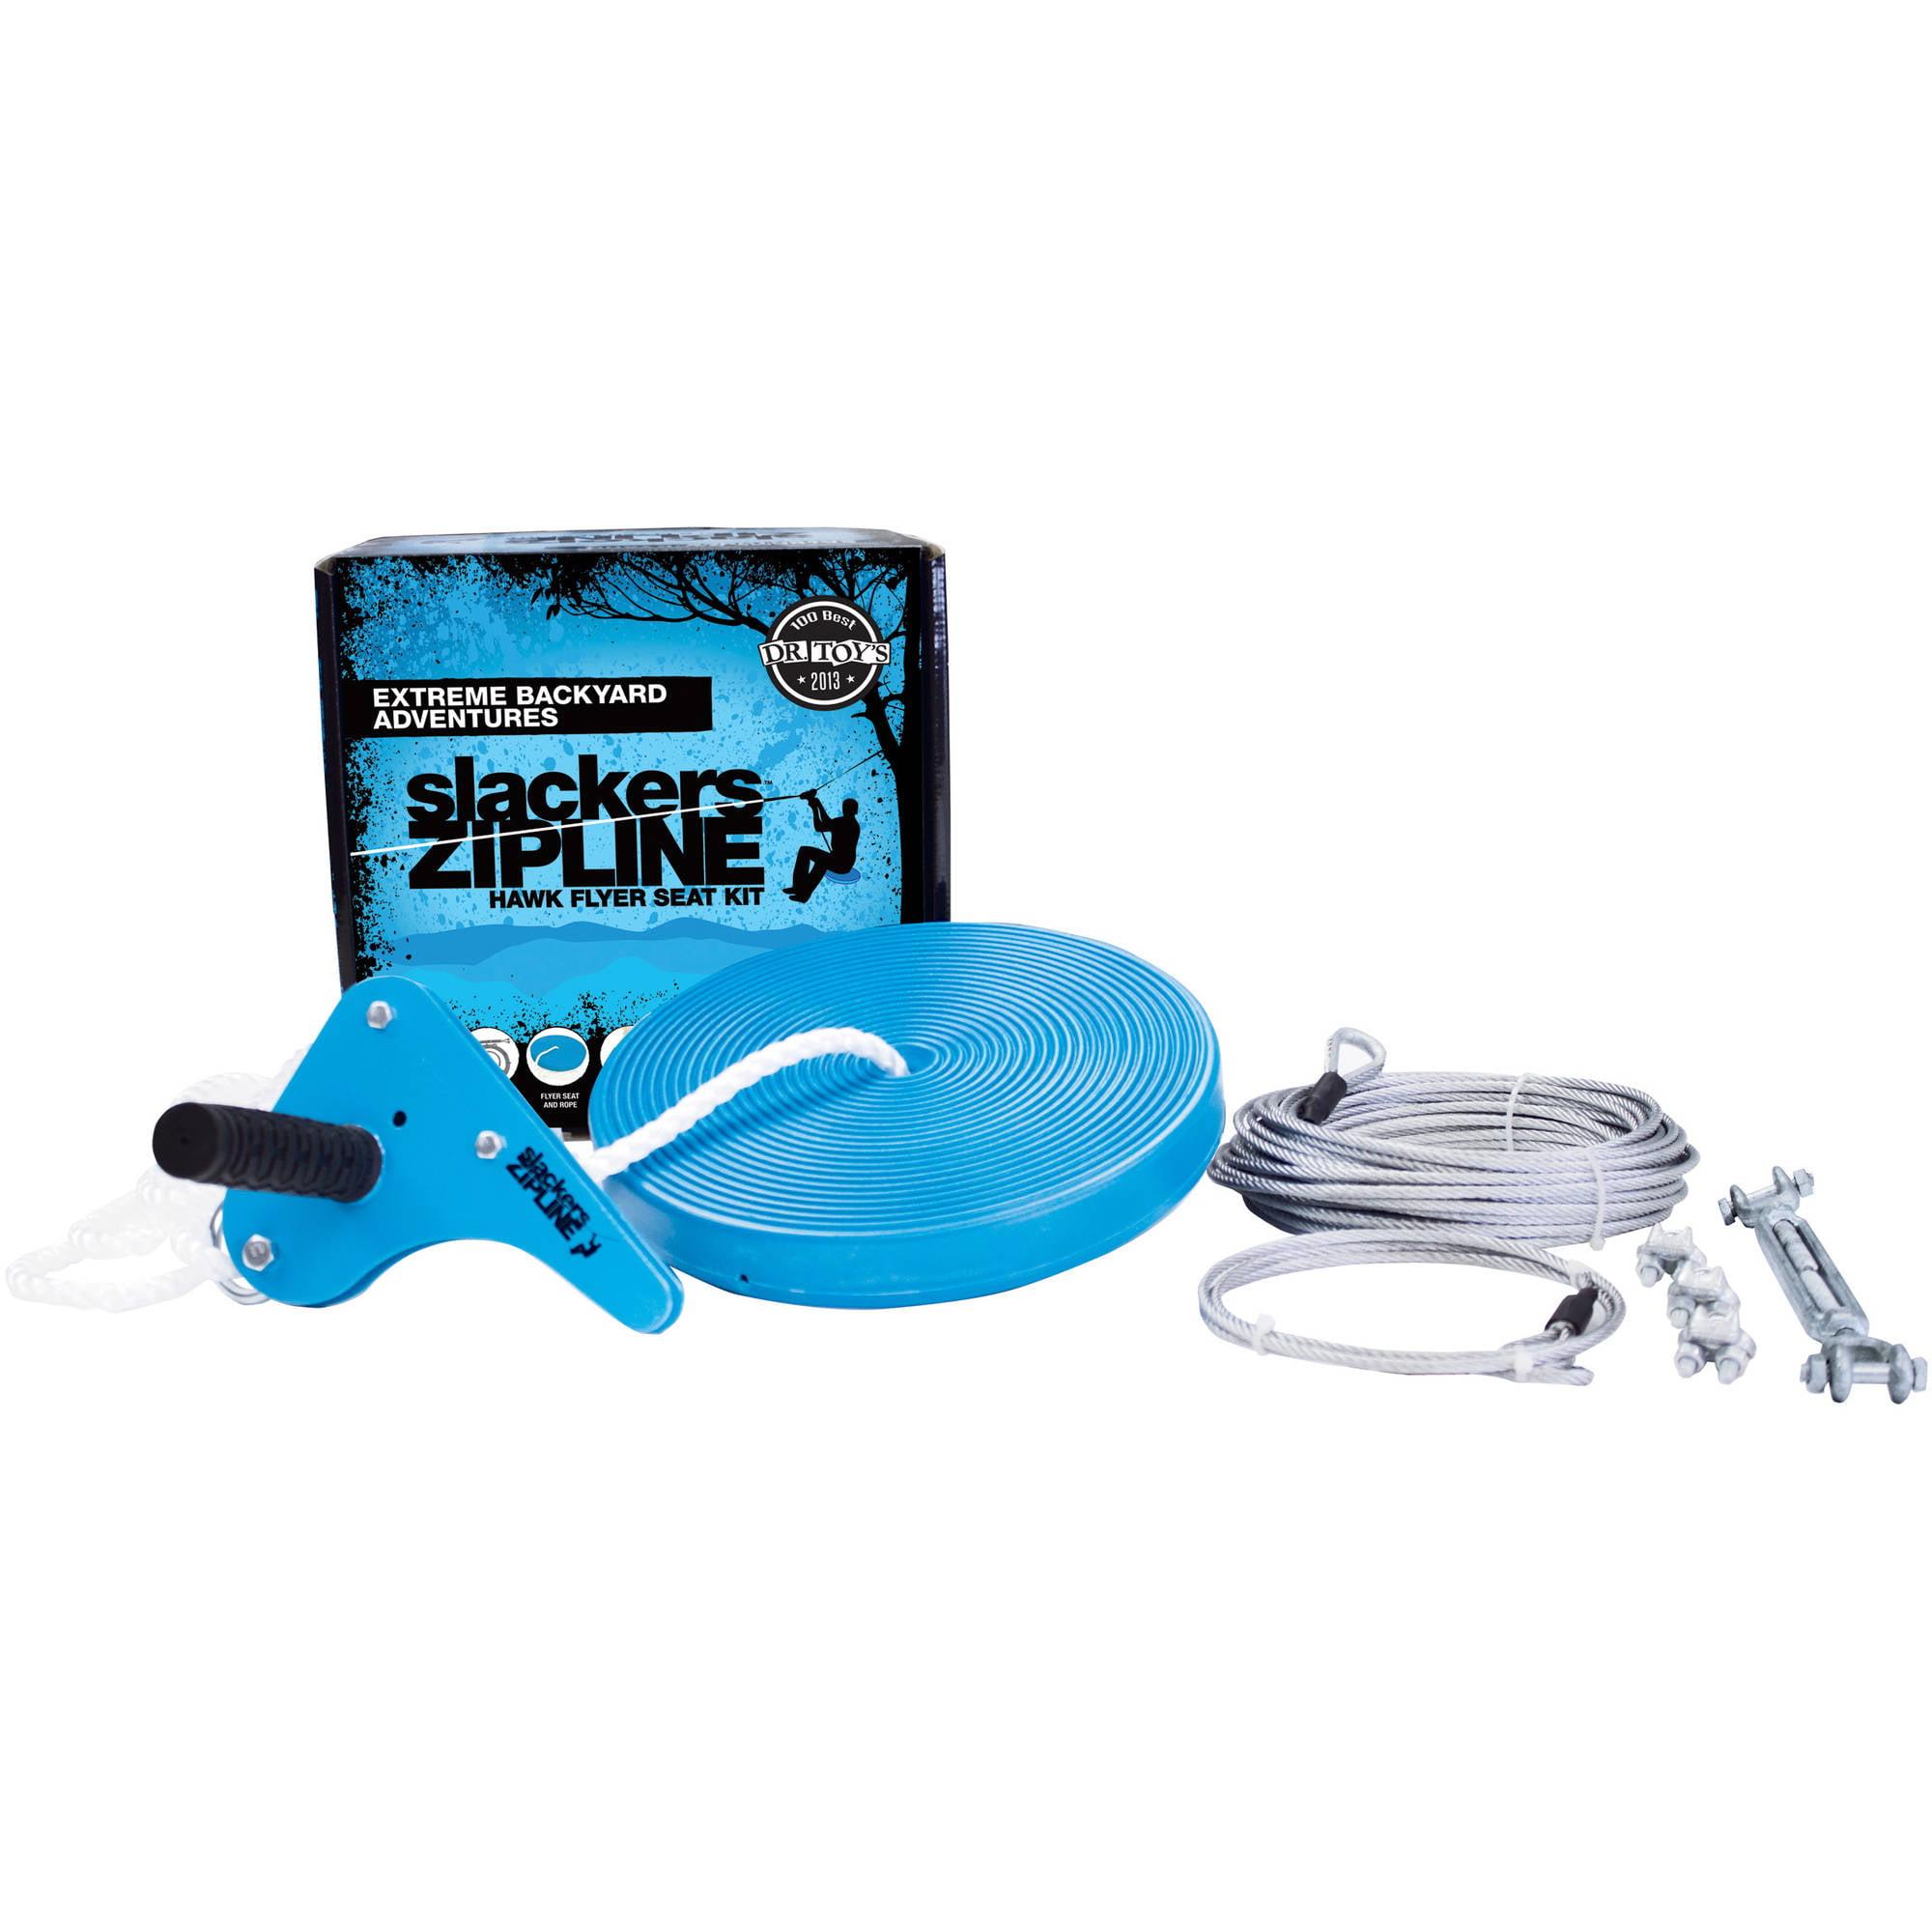 Slackers 70\' Hawk Series Zipline Kit with Seat - Walmart.com